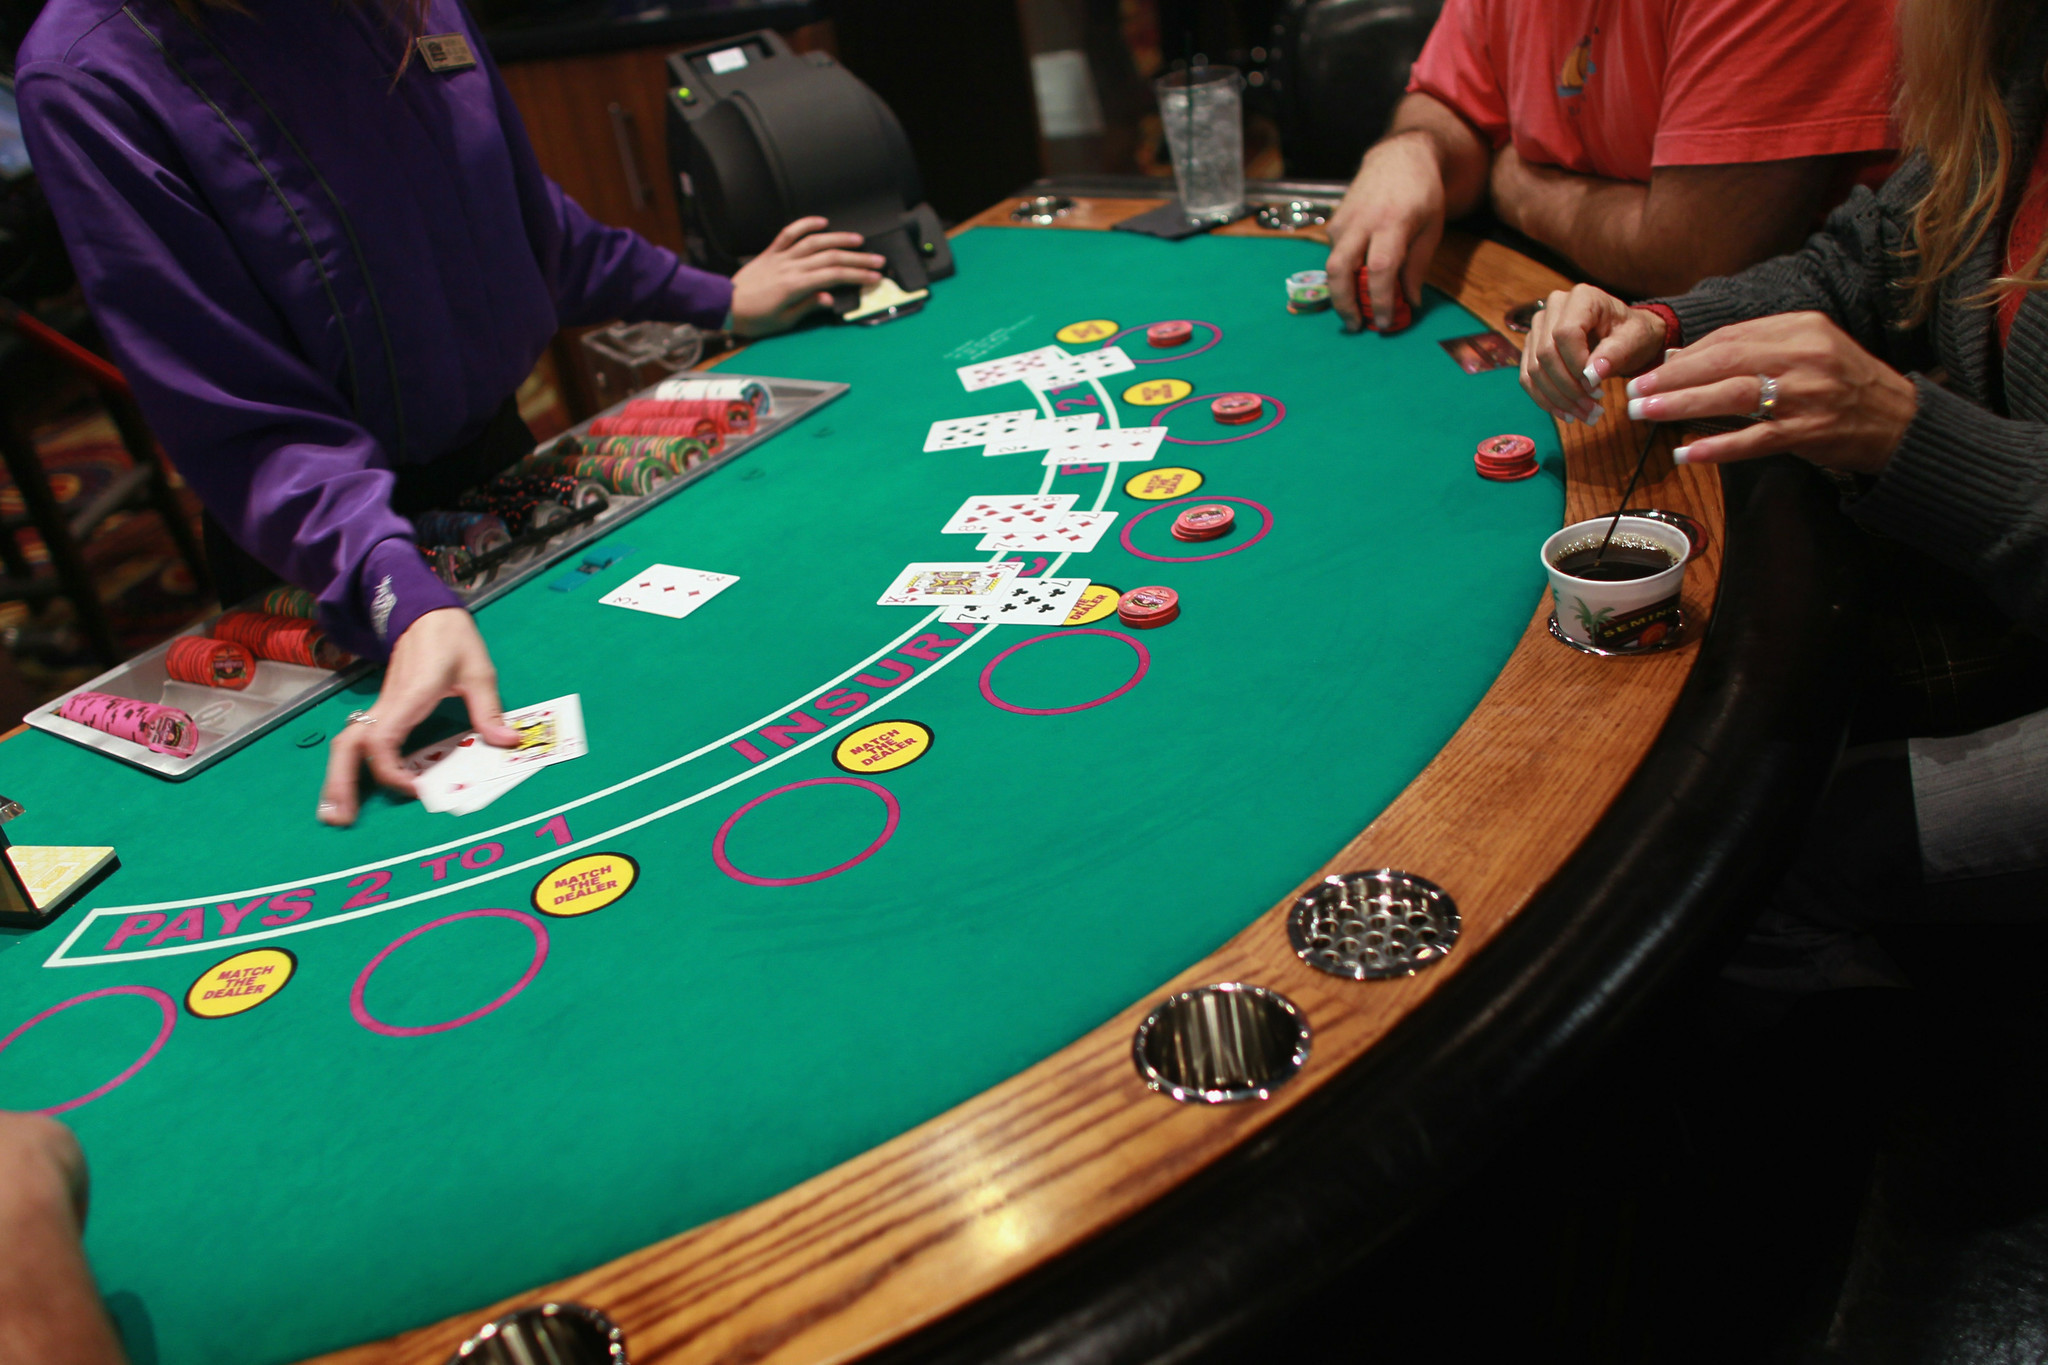 Casino with black jack broward county fl minneapolis s paolo mystic lake casino